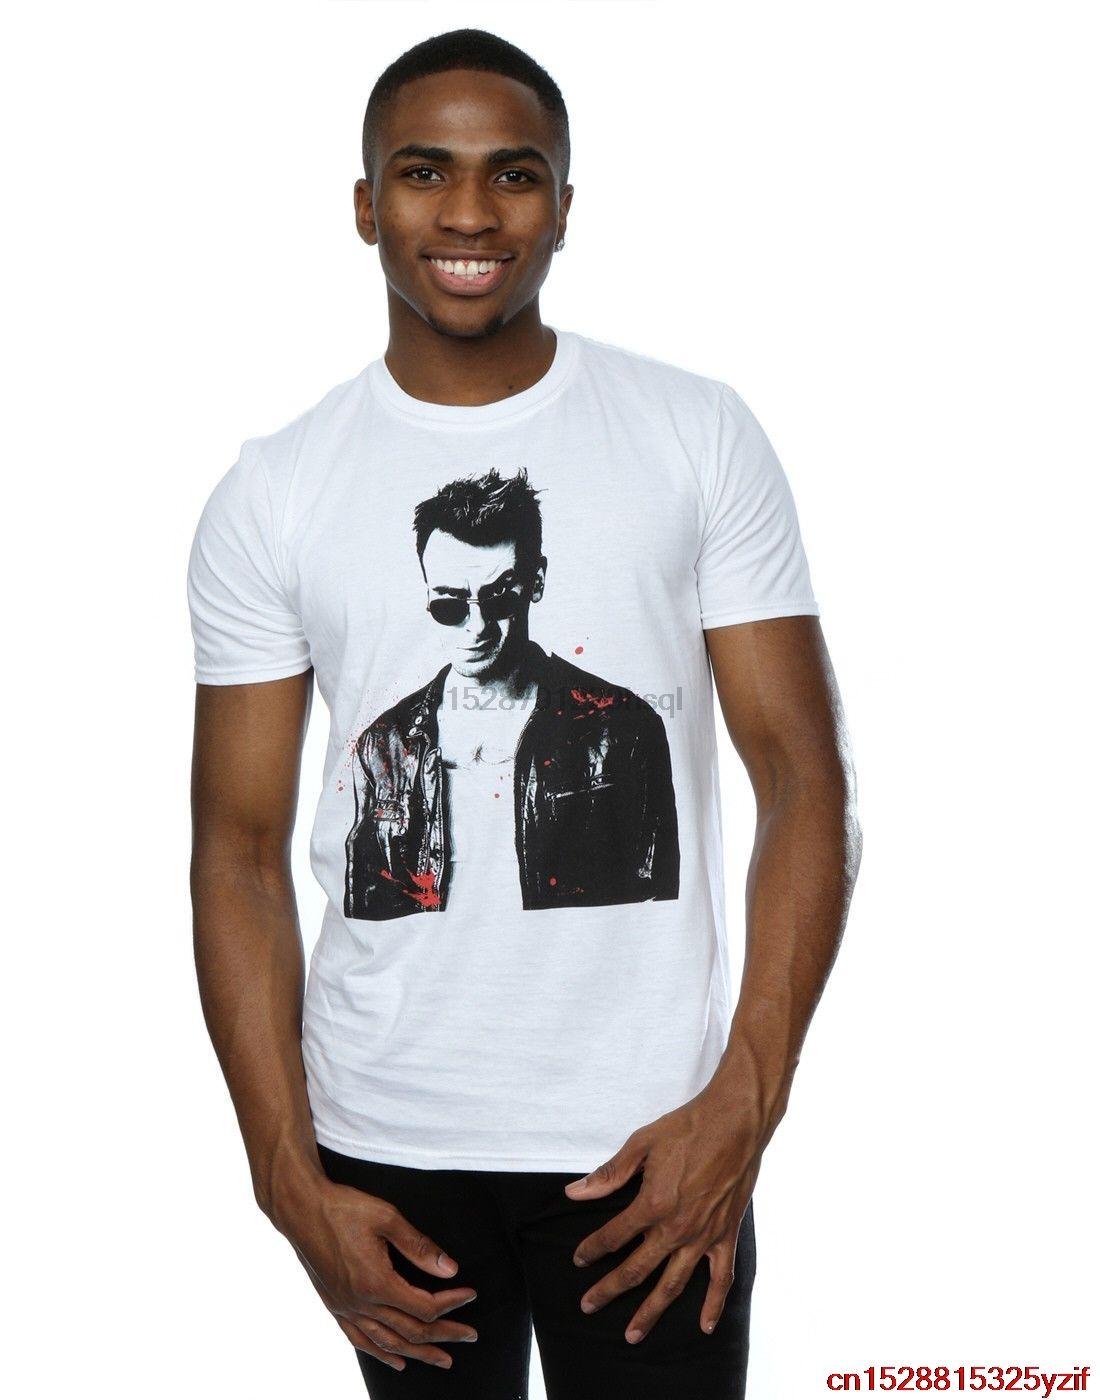 Prédicateur Hommes Cassidy Vampire T-shirt Nouveau T-shirt de mode d'hommes T-shirts Top T-shirts d'été Hipster Hommes T-shirt Le Nouveau